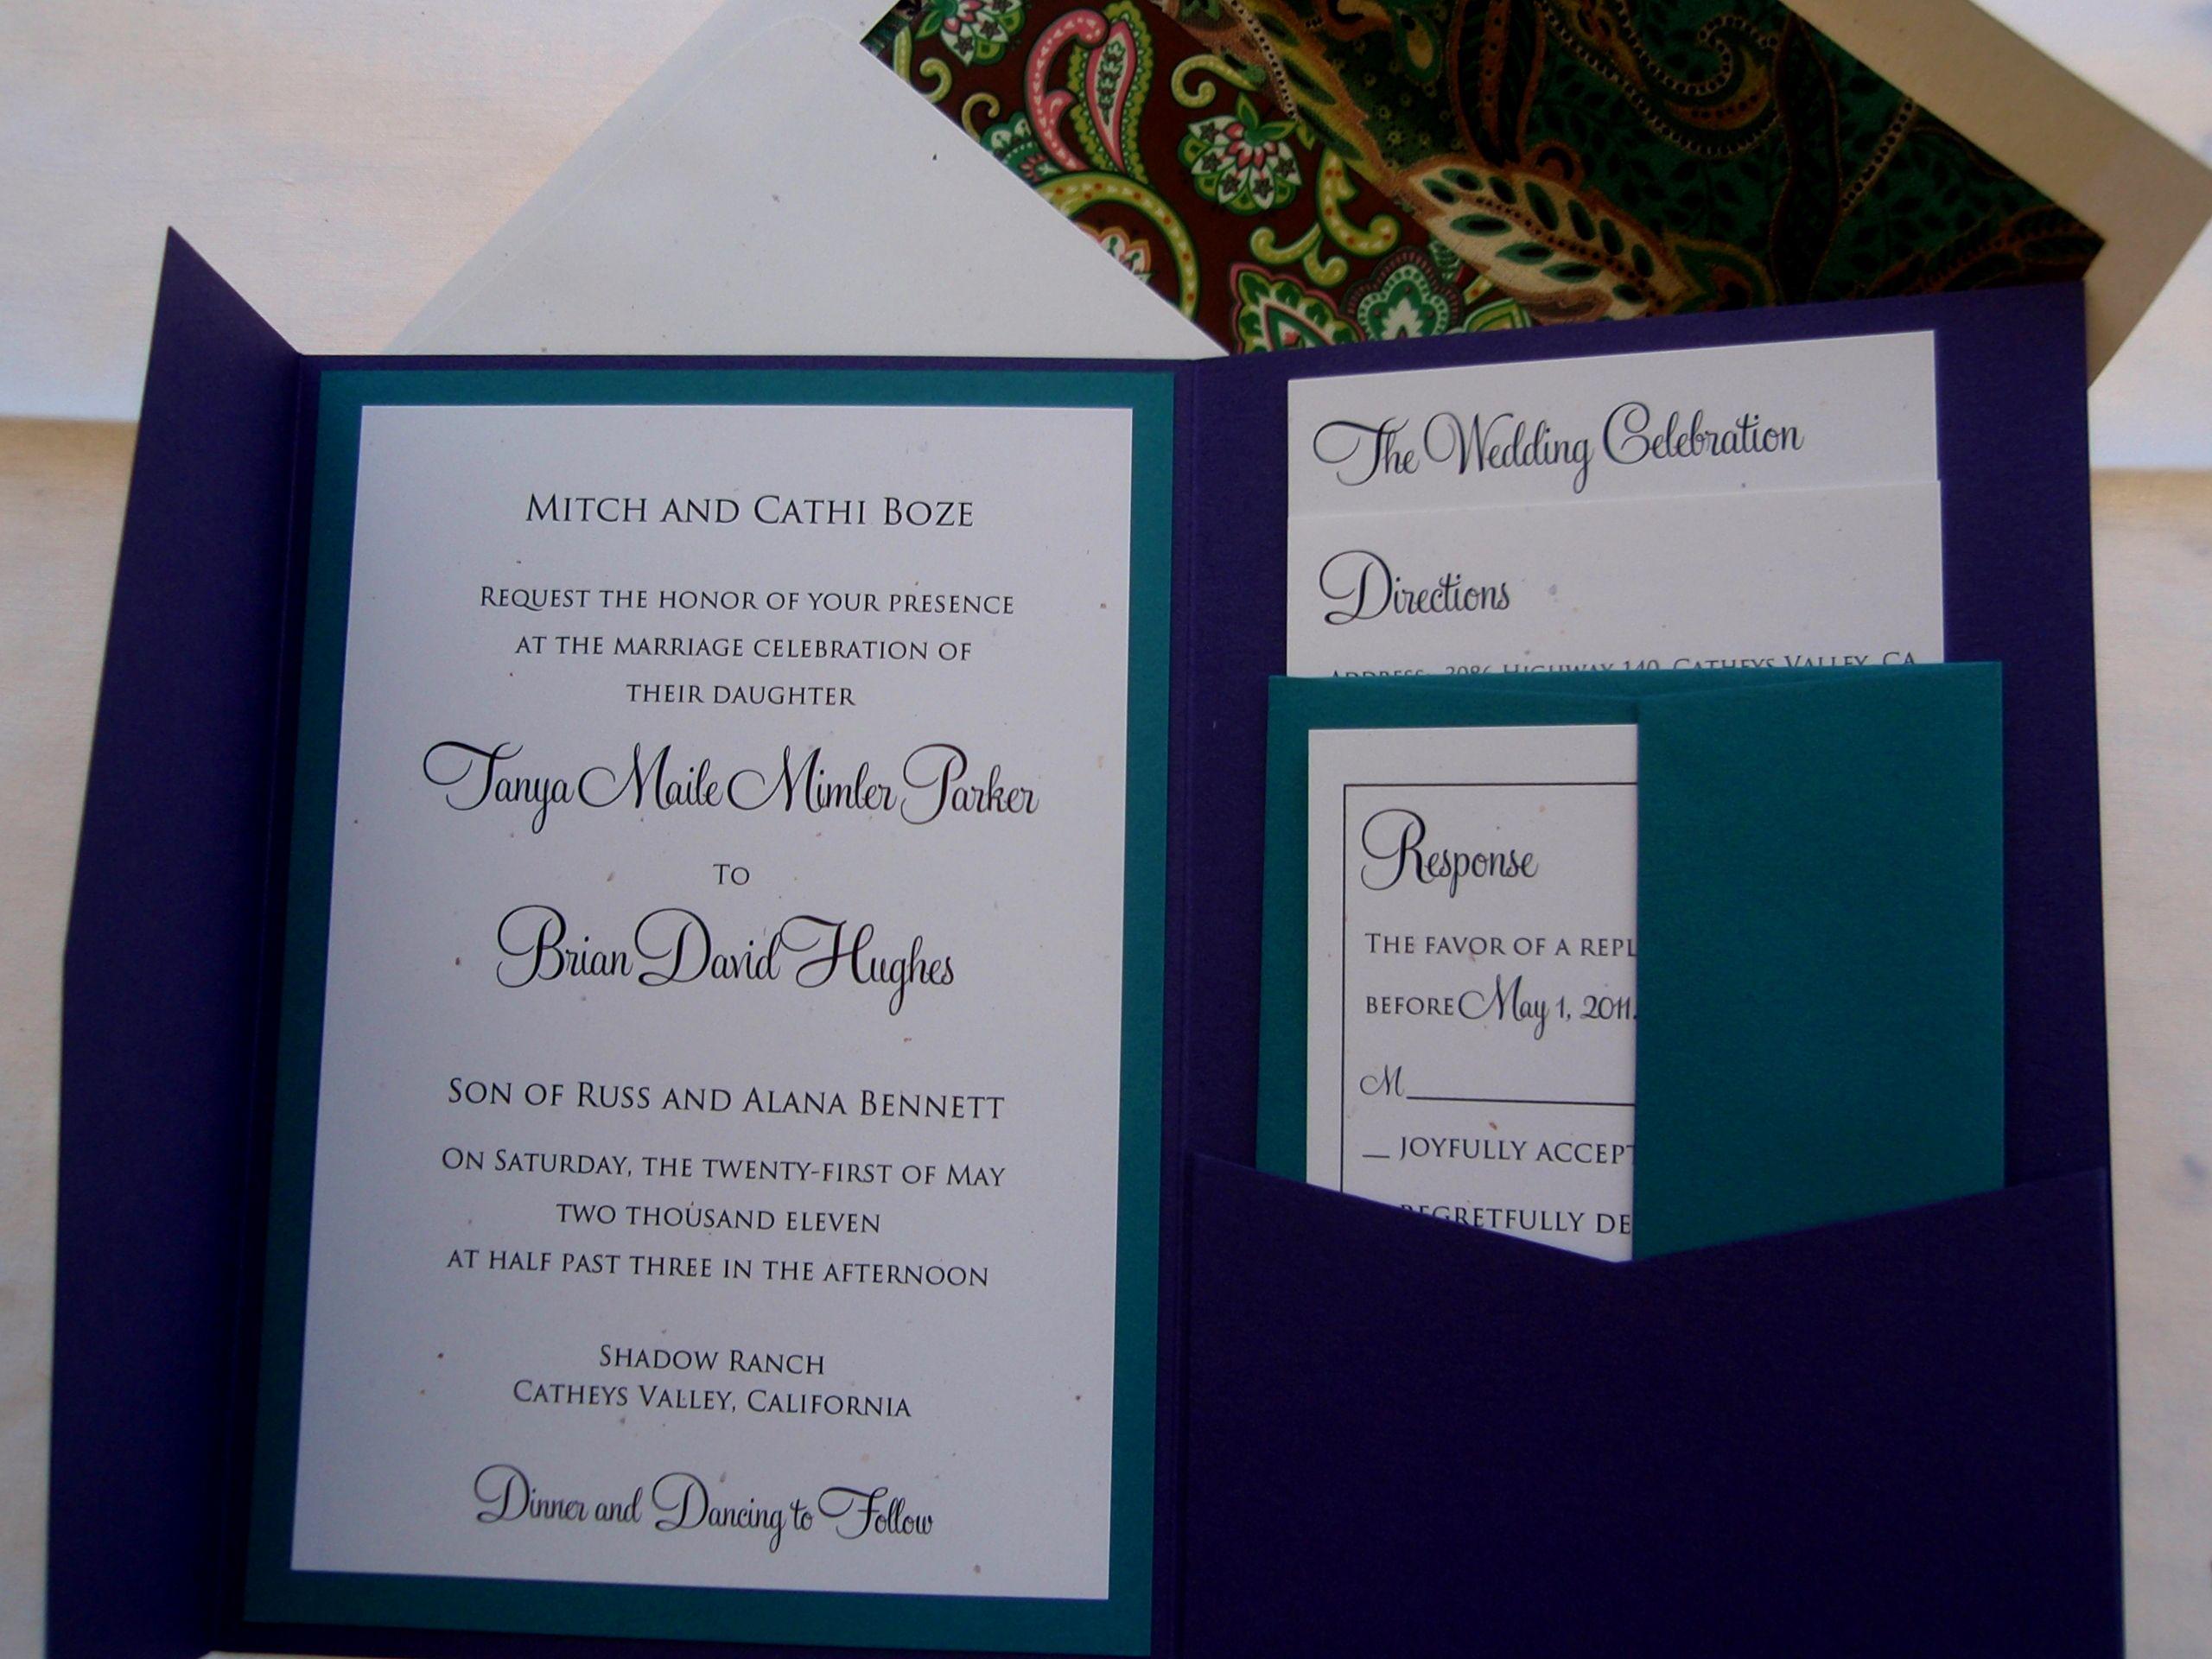 Diy pocketfold invitations wedding diy wedding invitation kits diy pocketfold invitations diy wedding invitation kitscouture monicamarmolfo Gallery